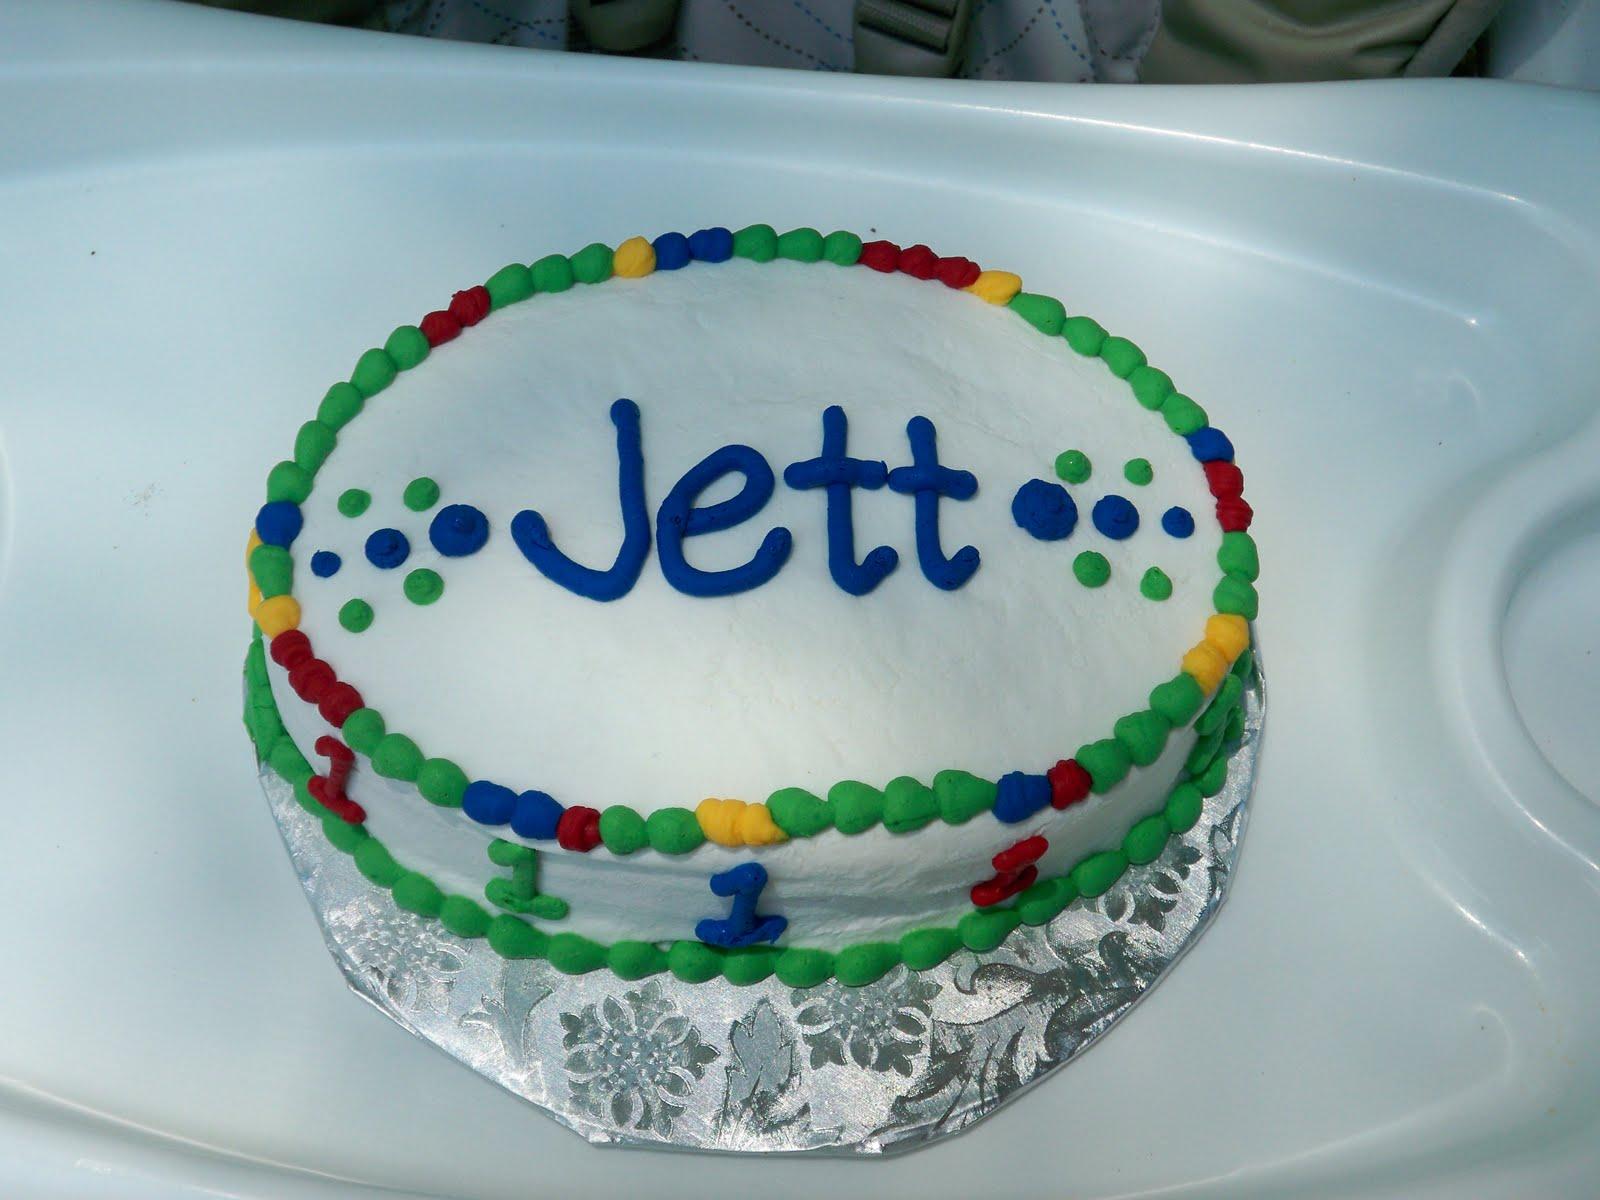 The Starlings Happy Birthday Jett